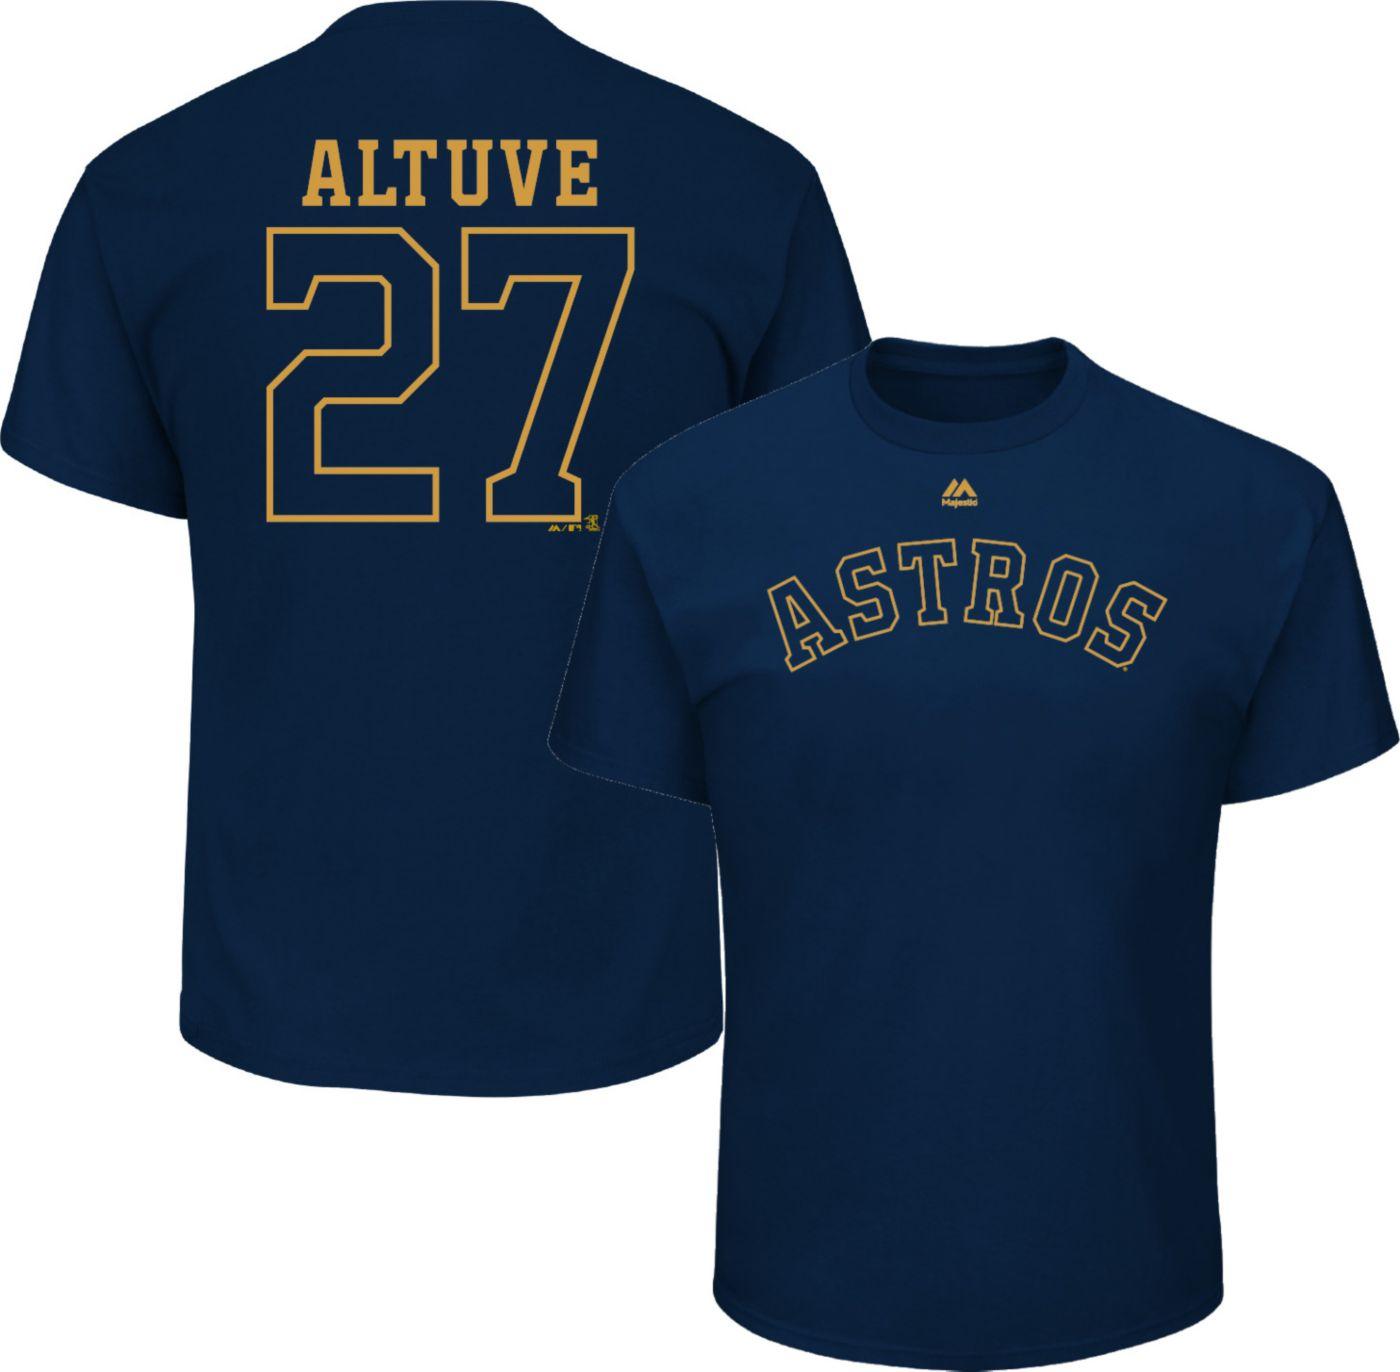 Majestic Men's Houston Astros Jose Altuve #27 Championship Gold T-Shirt